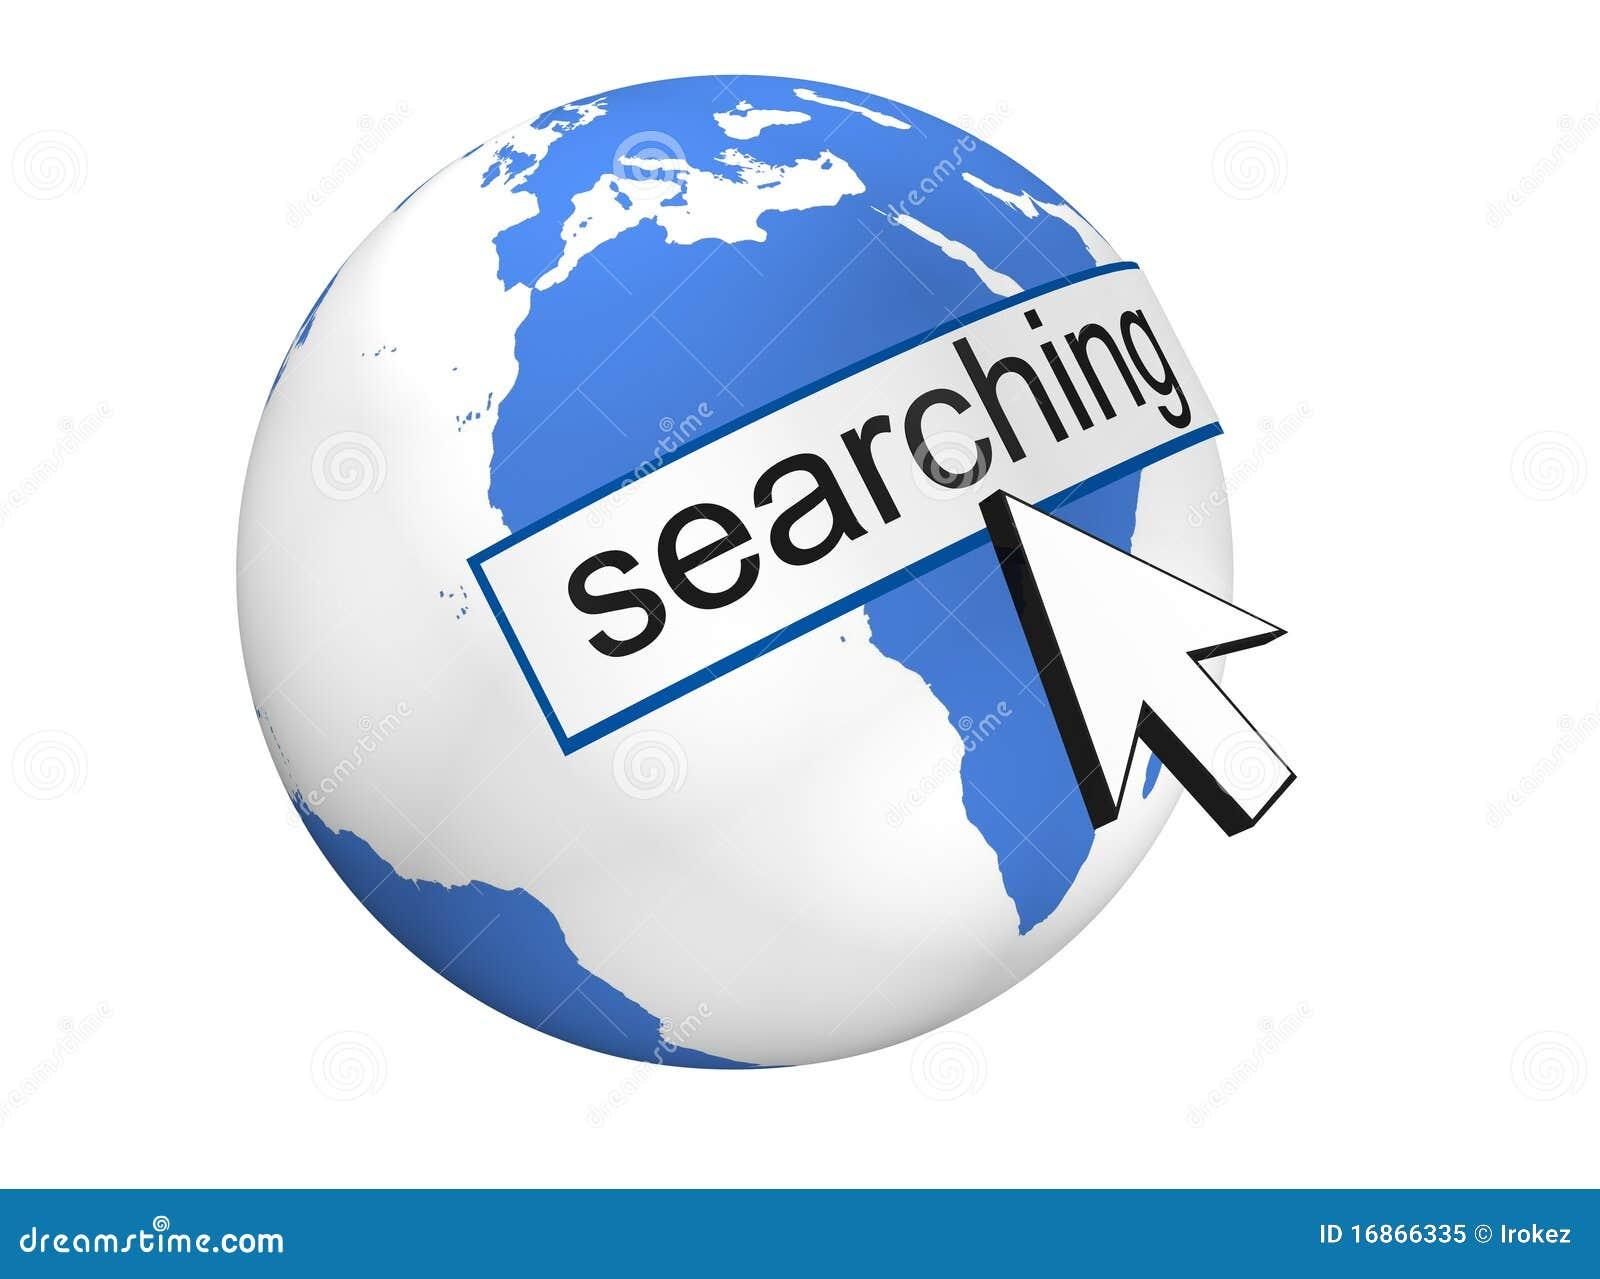 Busca do Internet